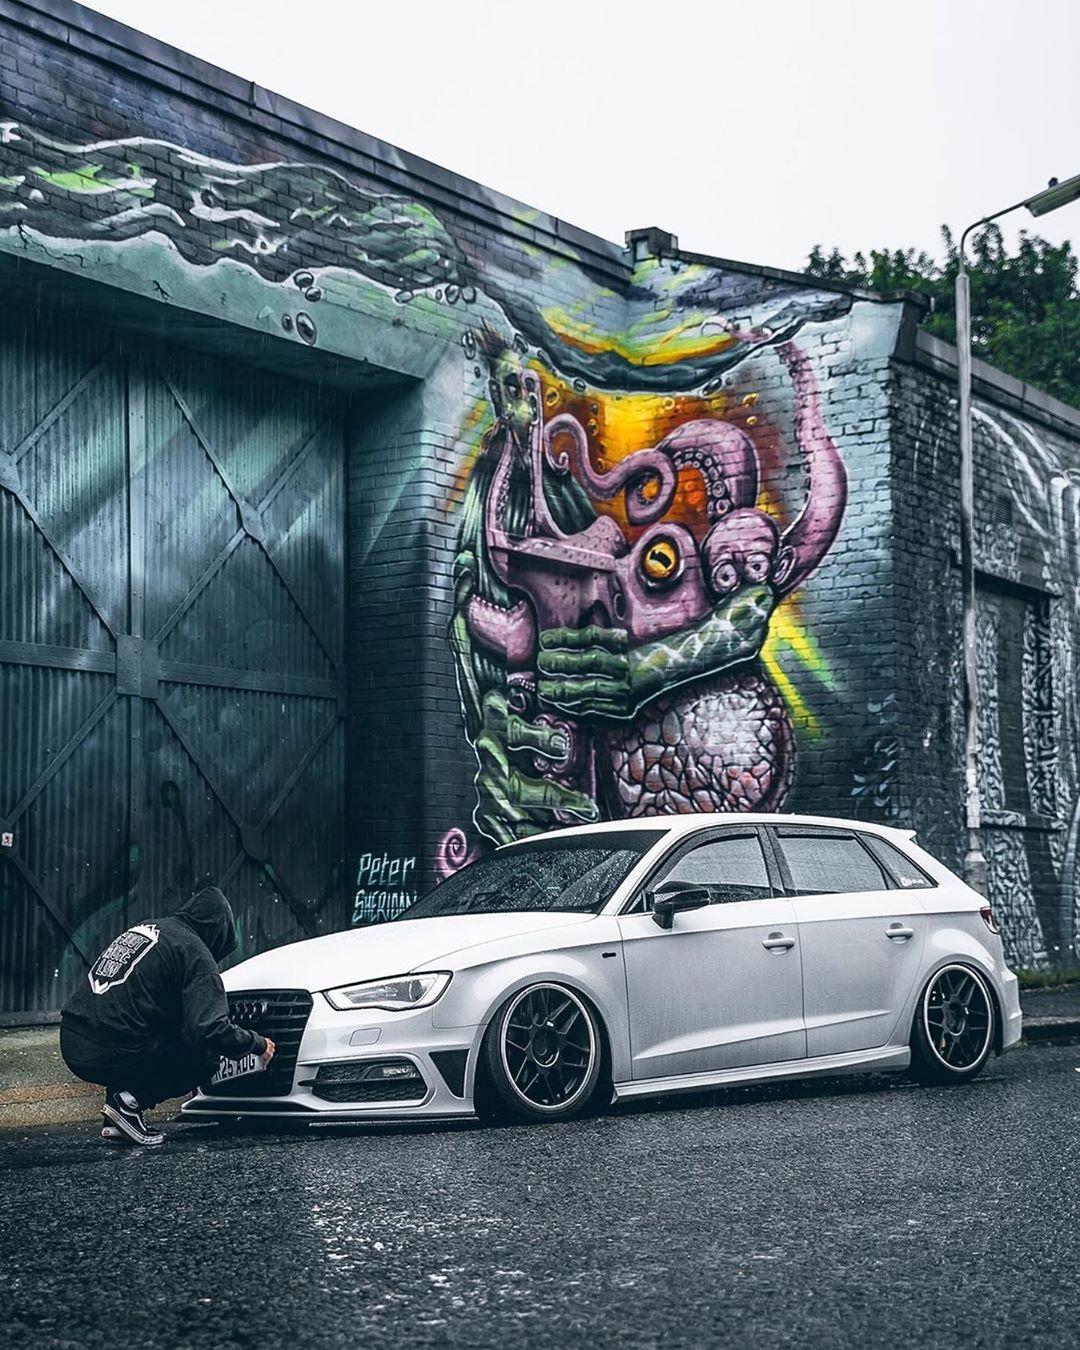 3SDM | Cast & Forged Alloy Wheel Brand 118404419_339520007181126_639242974075735099_n 3SDM 0.09  x Audi A3  Car :  Photo : p Blog Post